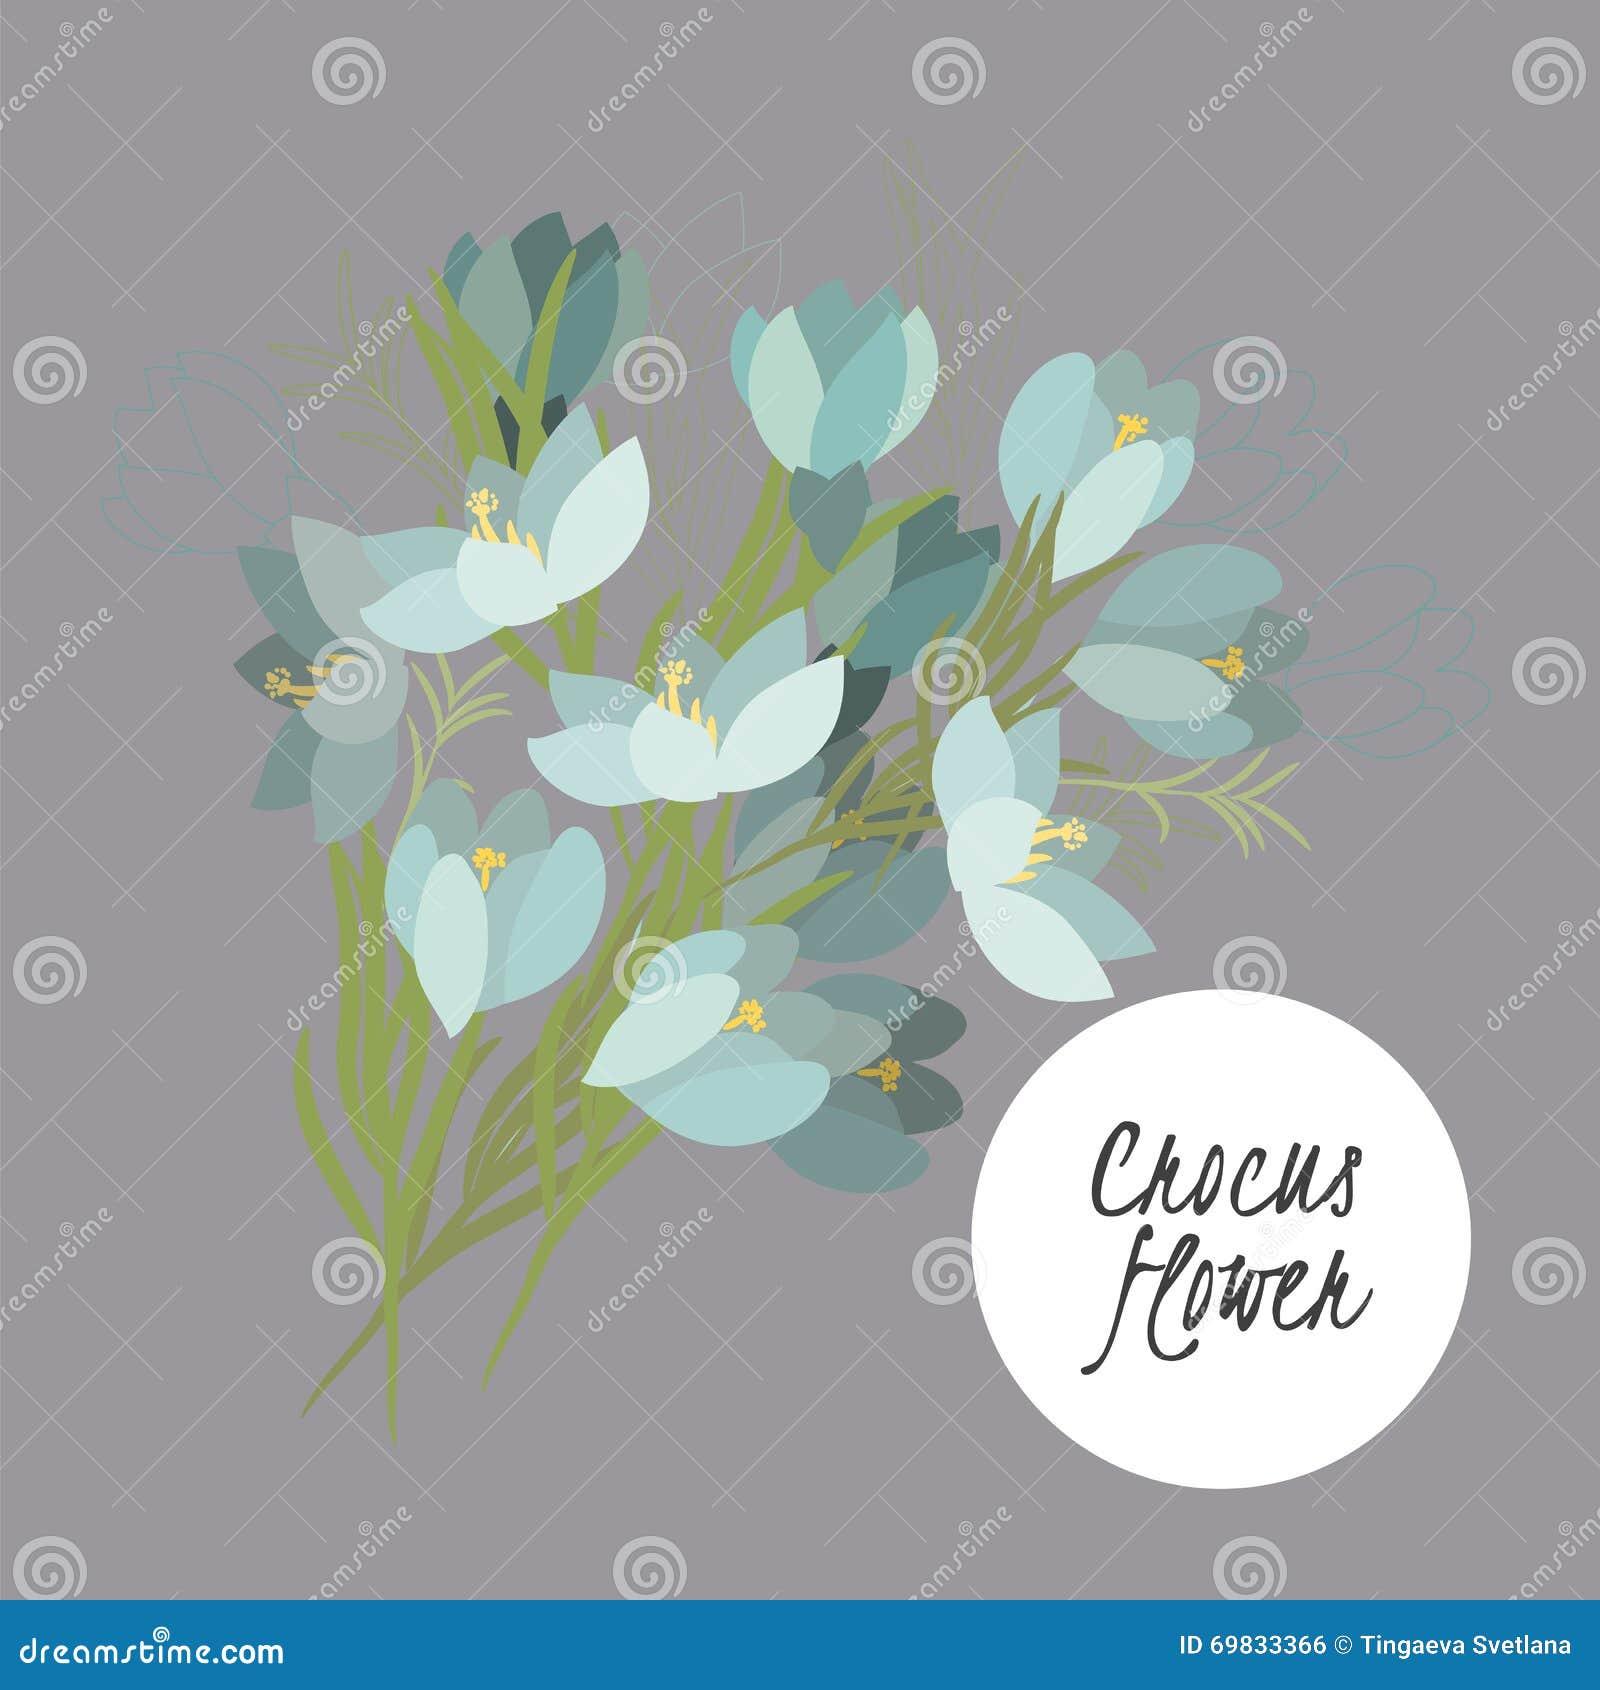 Delicate illustration crocus flower